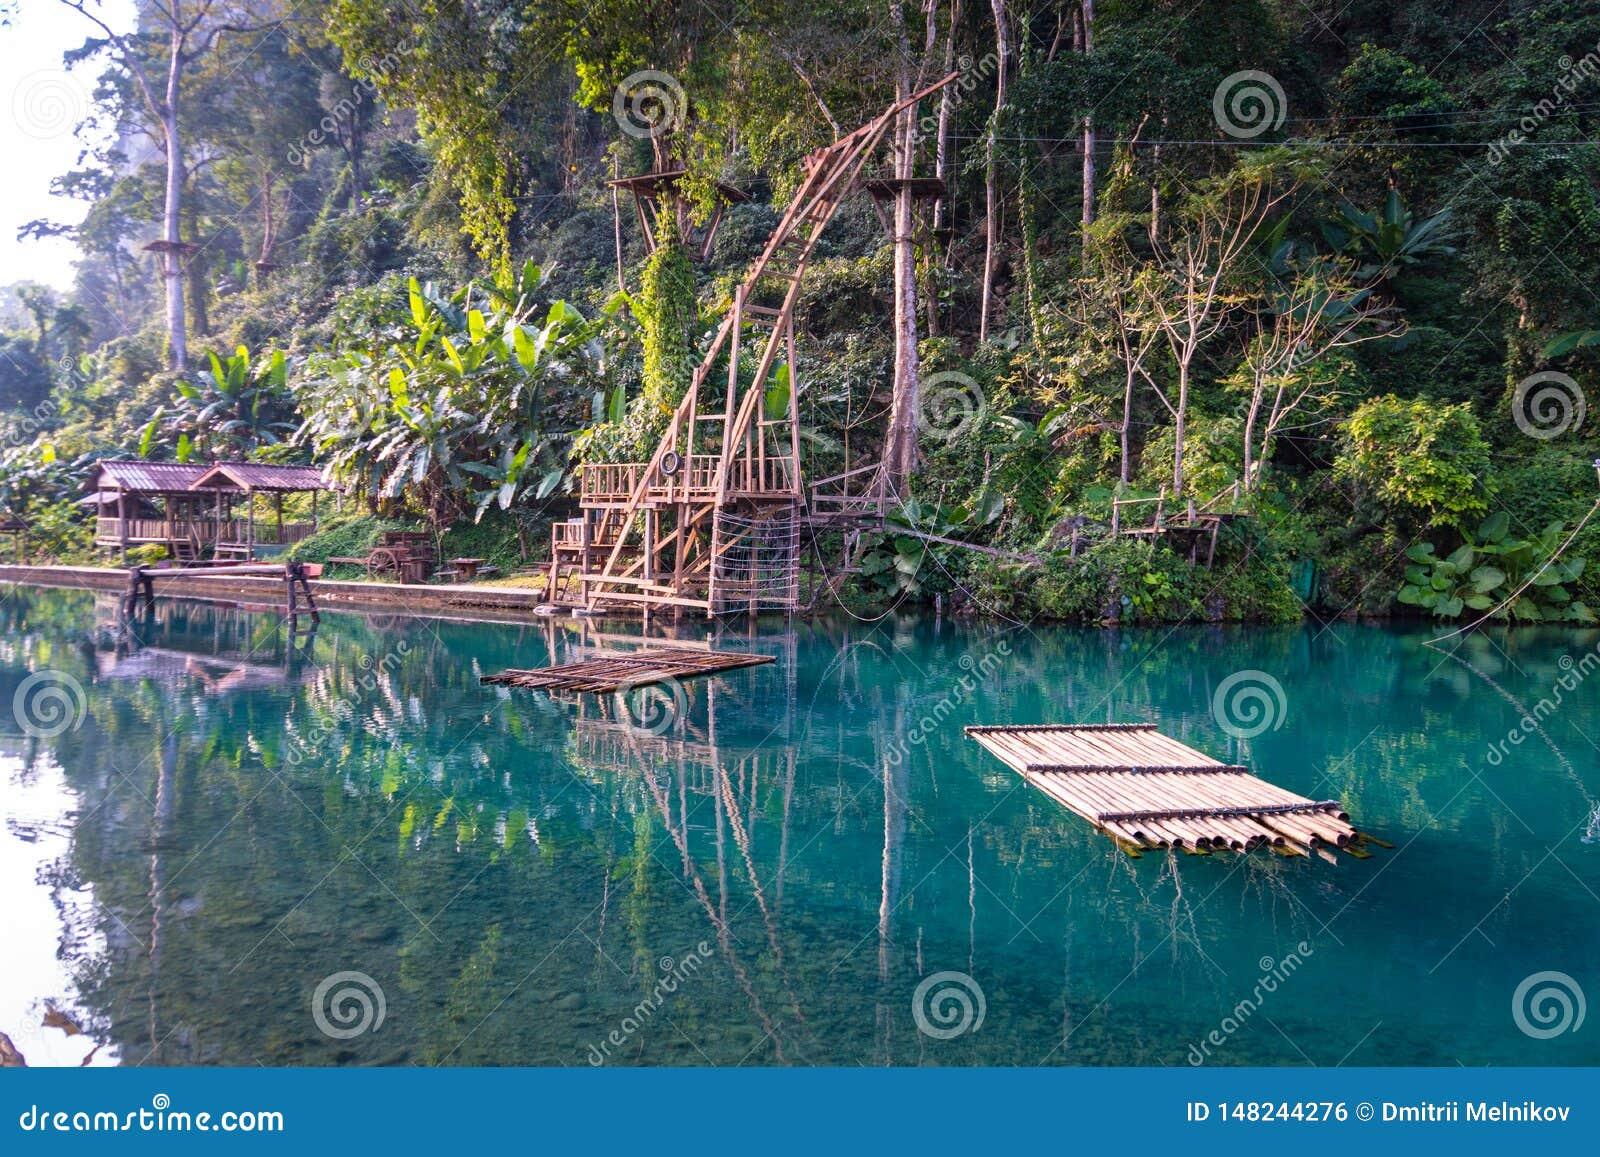 Blue Lagoon Vang Vieng Laos Stock Photo Image Of Colorful Recreation 148244276